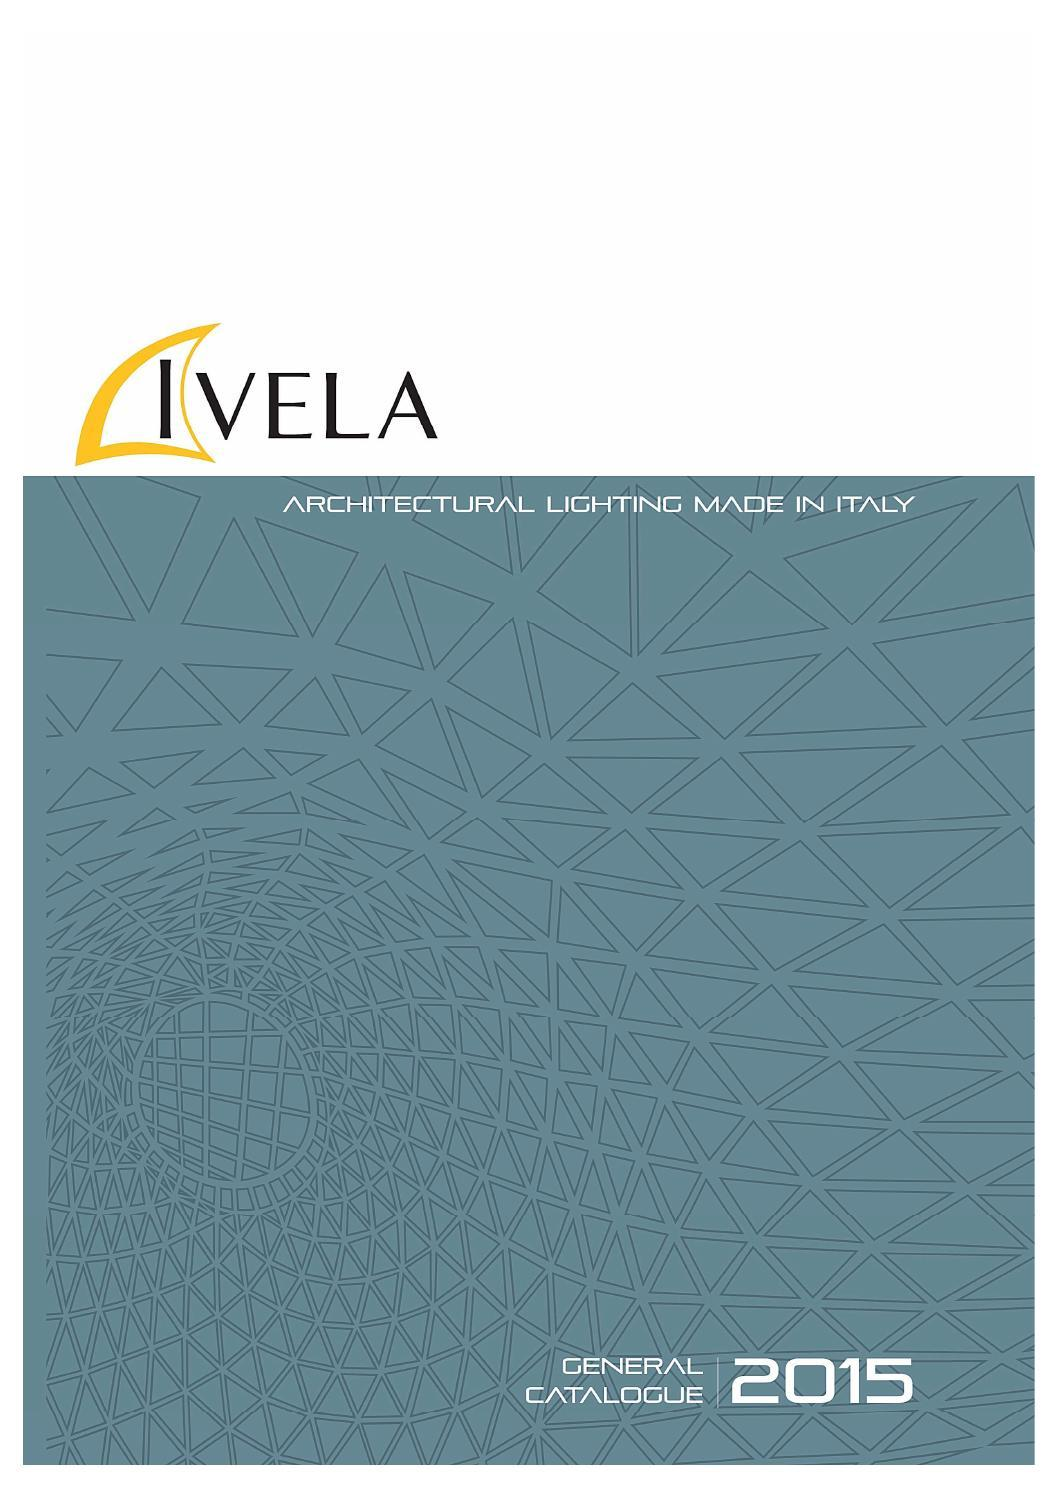 ivela 2015年led灯设计书籍目录. _1058*1497